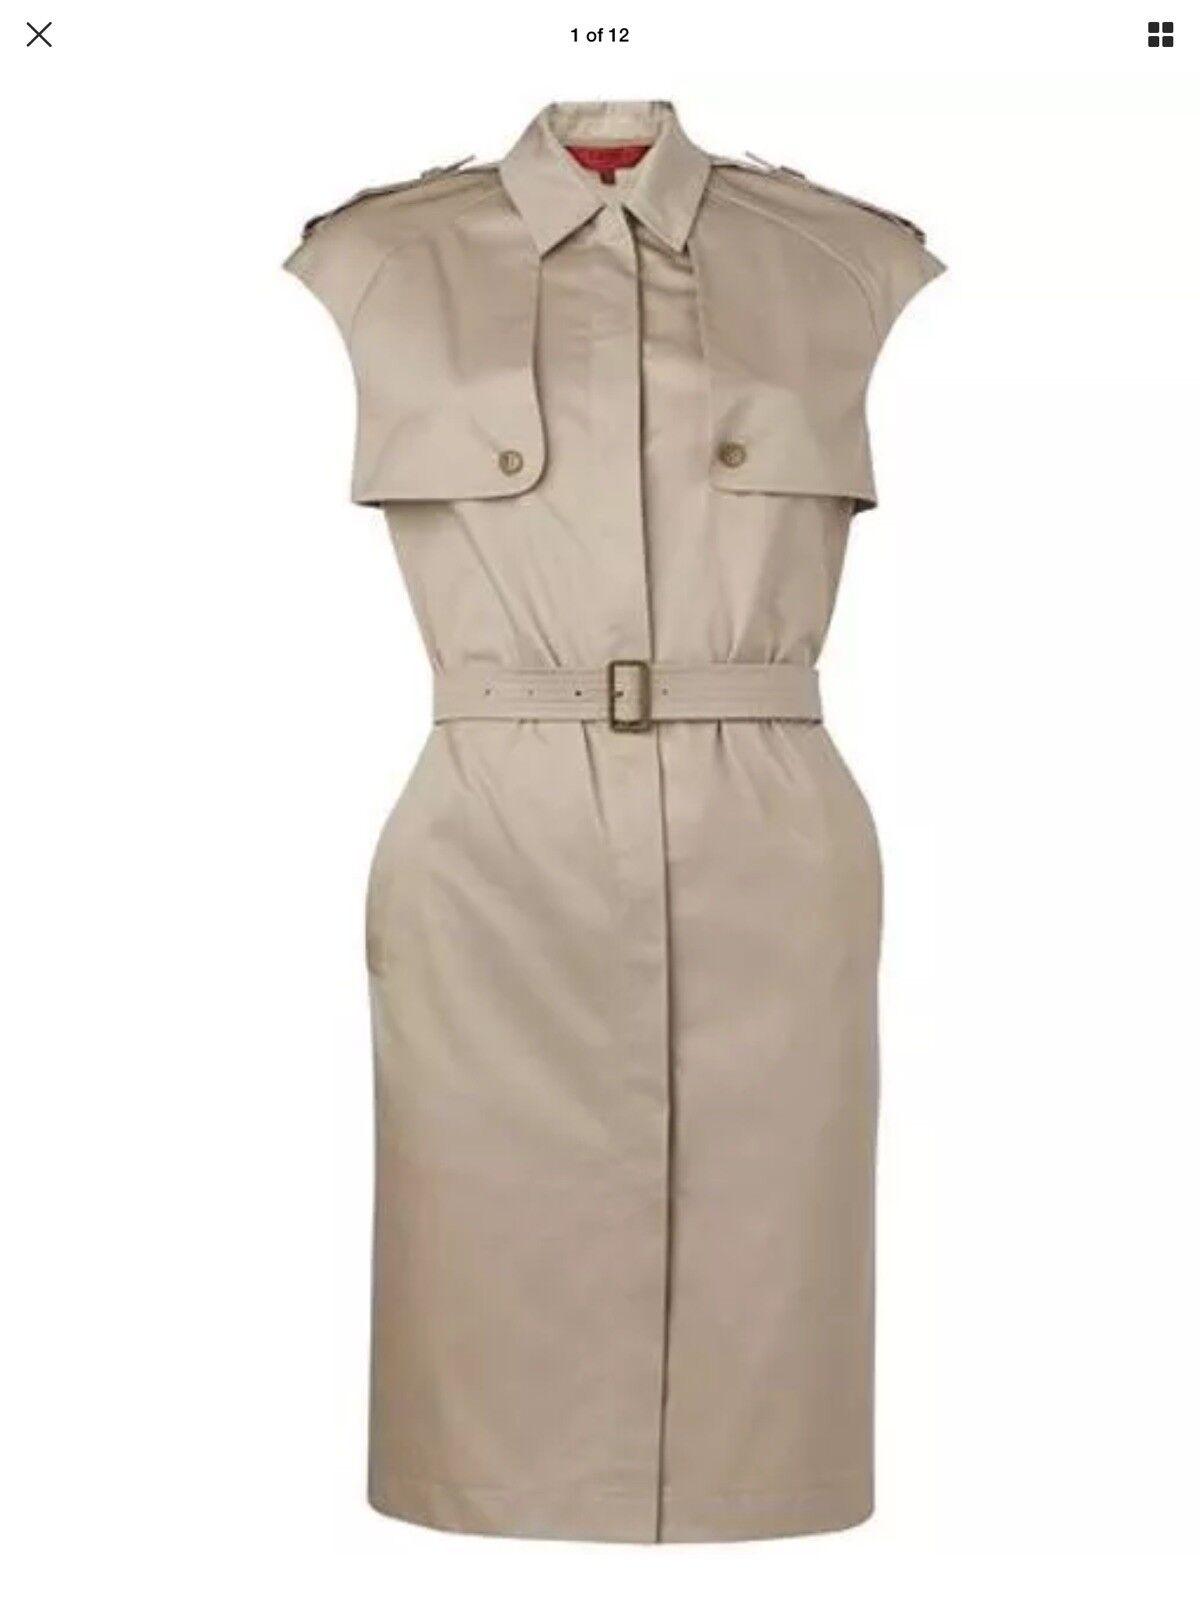 Lk Bennett London Amanda Sleeveless Beige Mili 100% Cotton Dress Größe-14 BNWOT